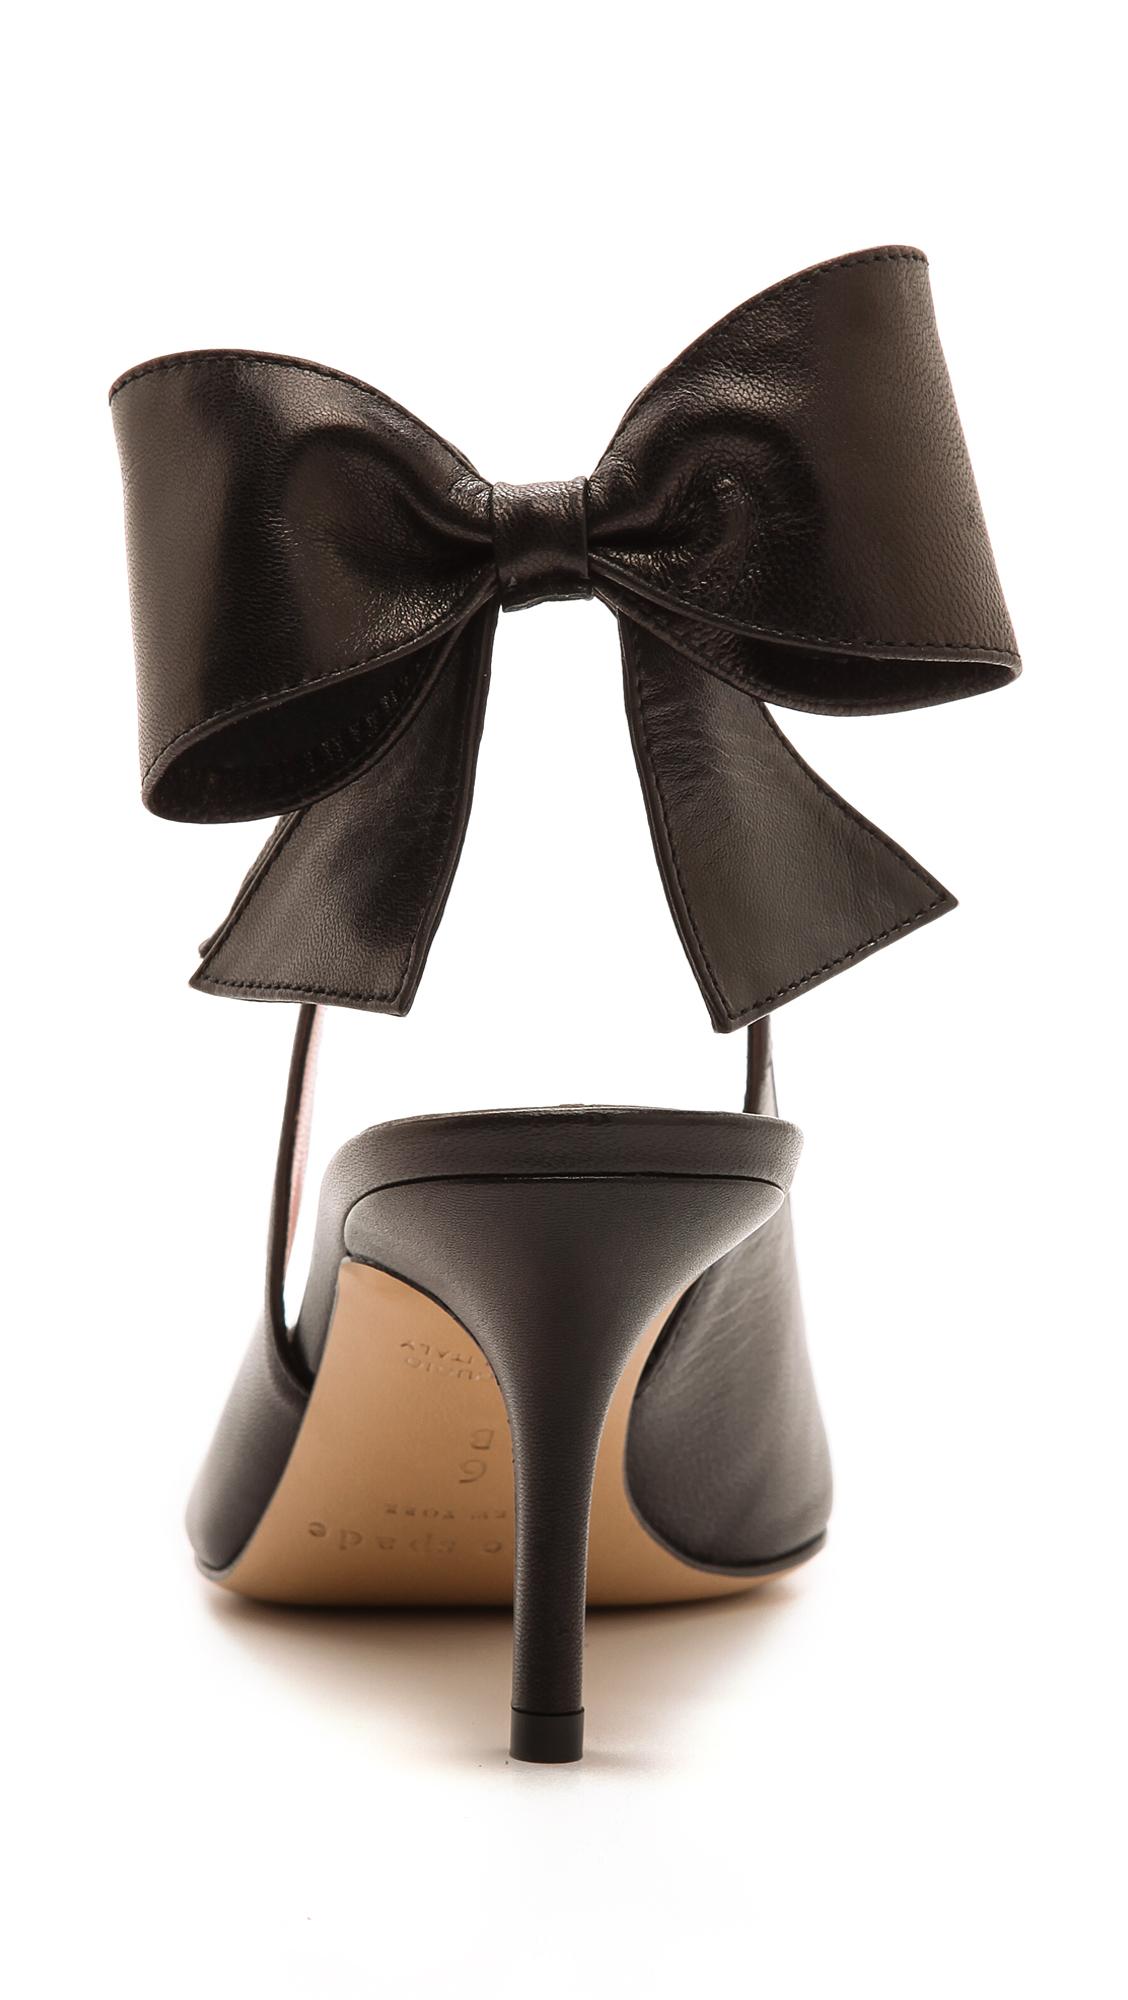 3bcd6505ebda Lyst - Kate Spade Jax Slingback Bow Pumps Black in Black